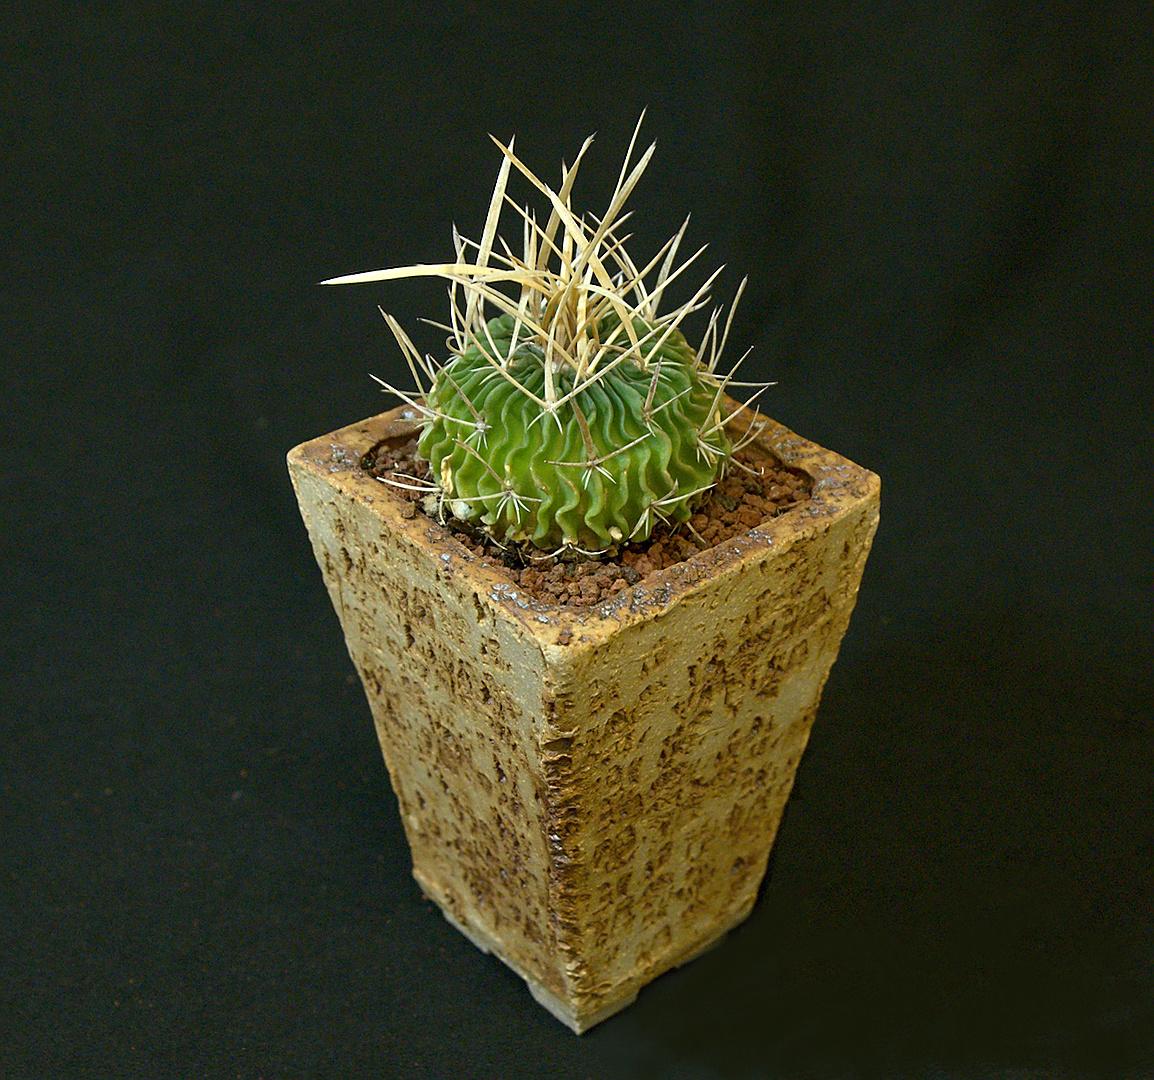 SCCSS 2019 February - Winner Intermediate Cactus - Coni Nettles - Echinofossulocactus phyllacanthus